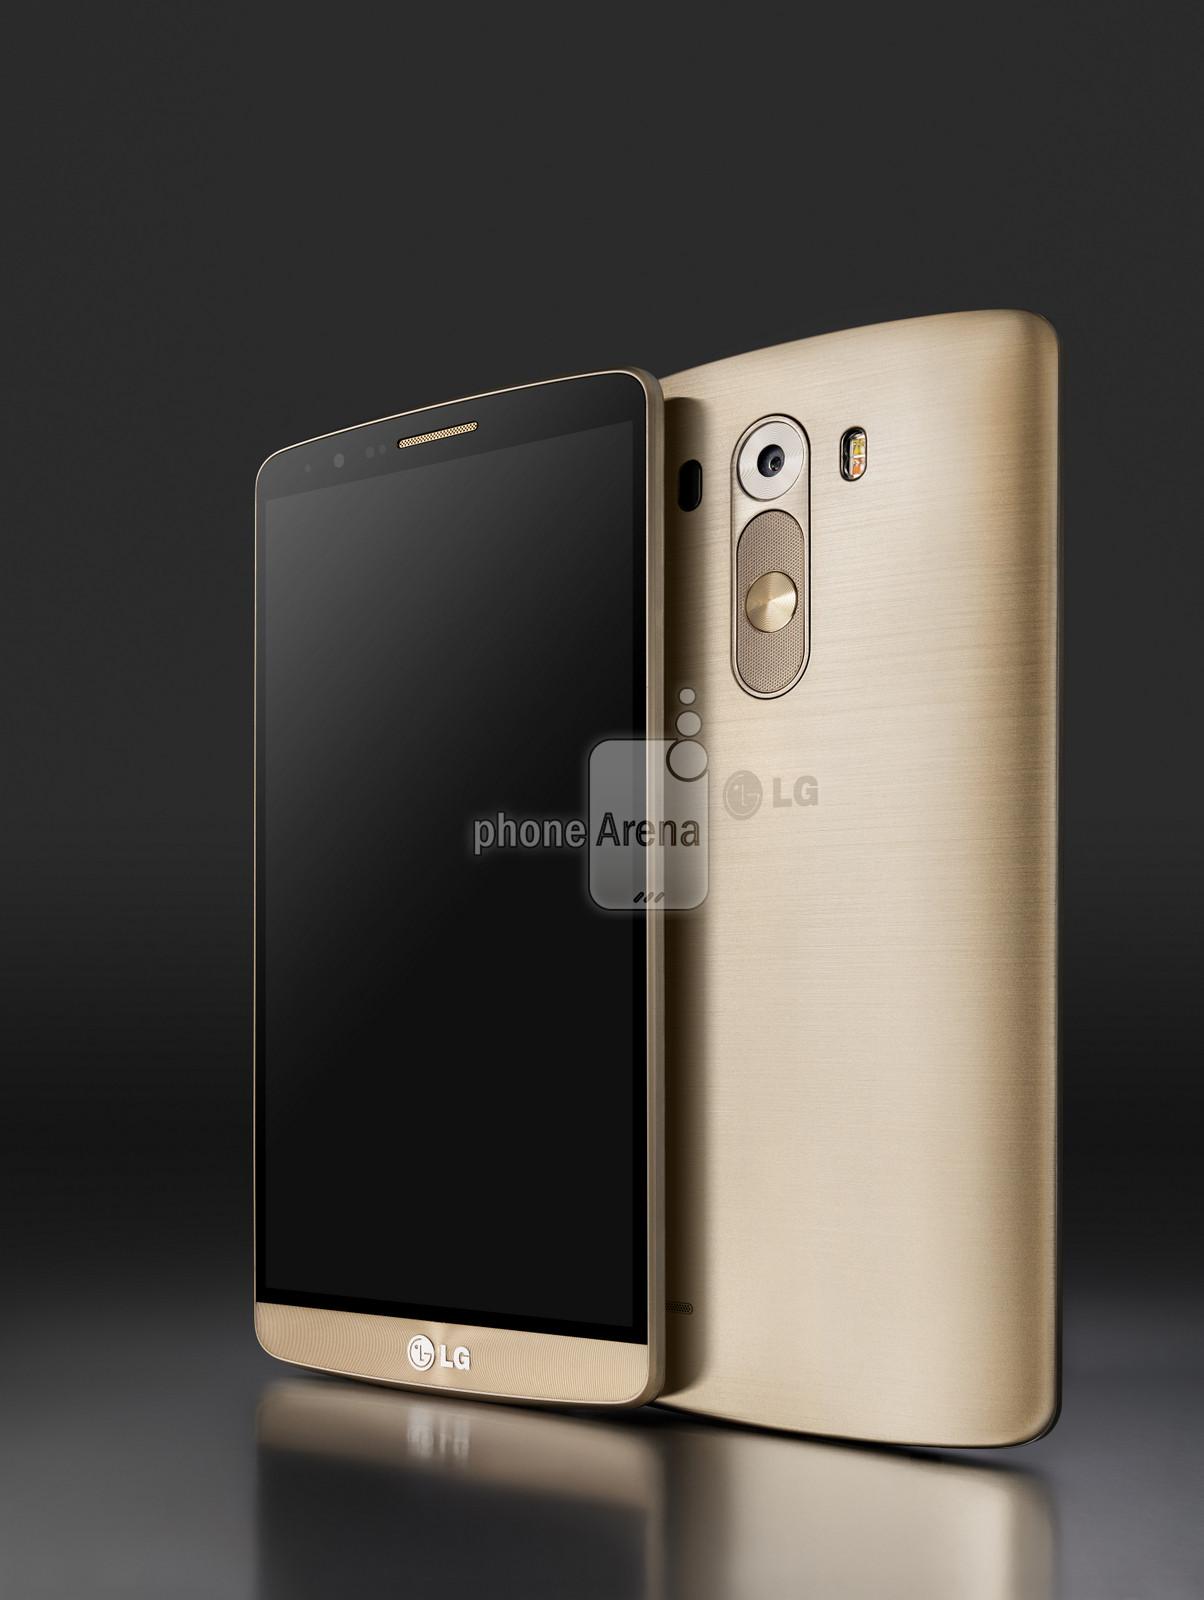 LG G3 5